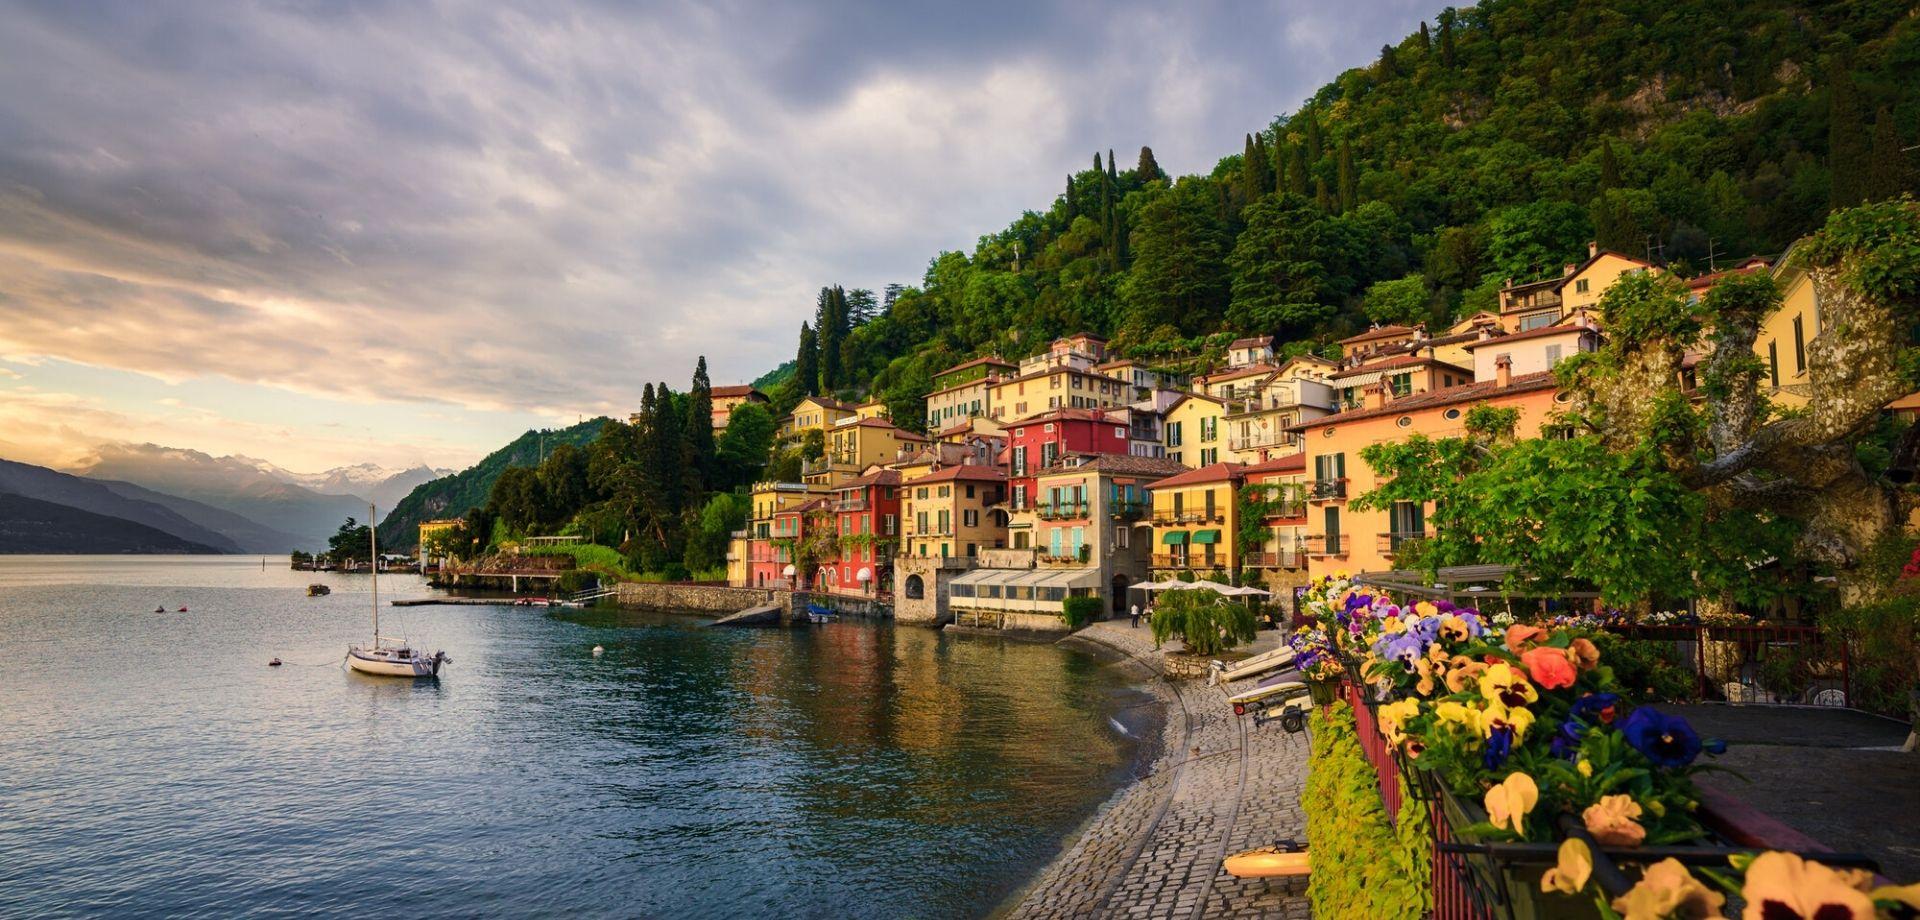 Lake Como Tours to discover the crotti